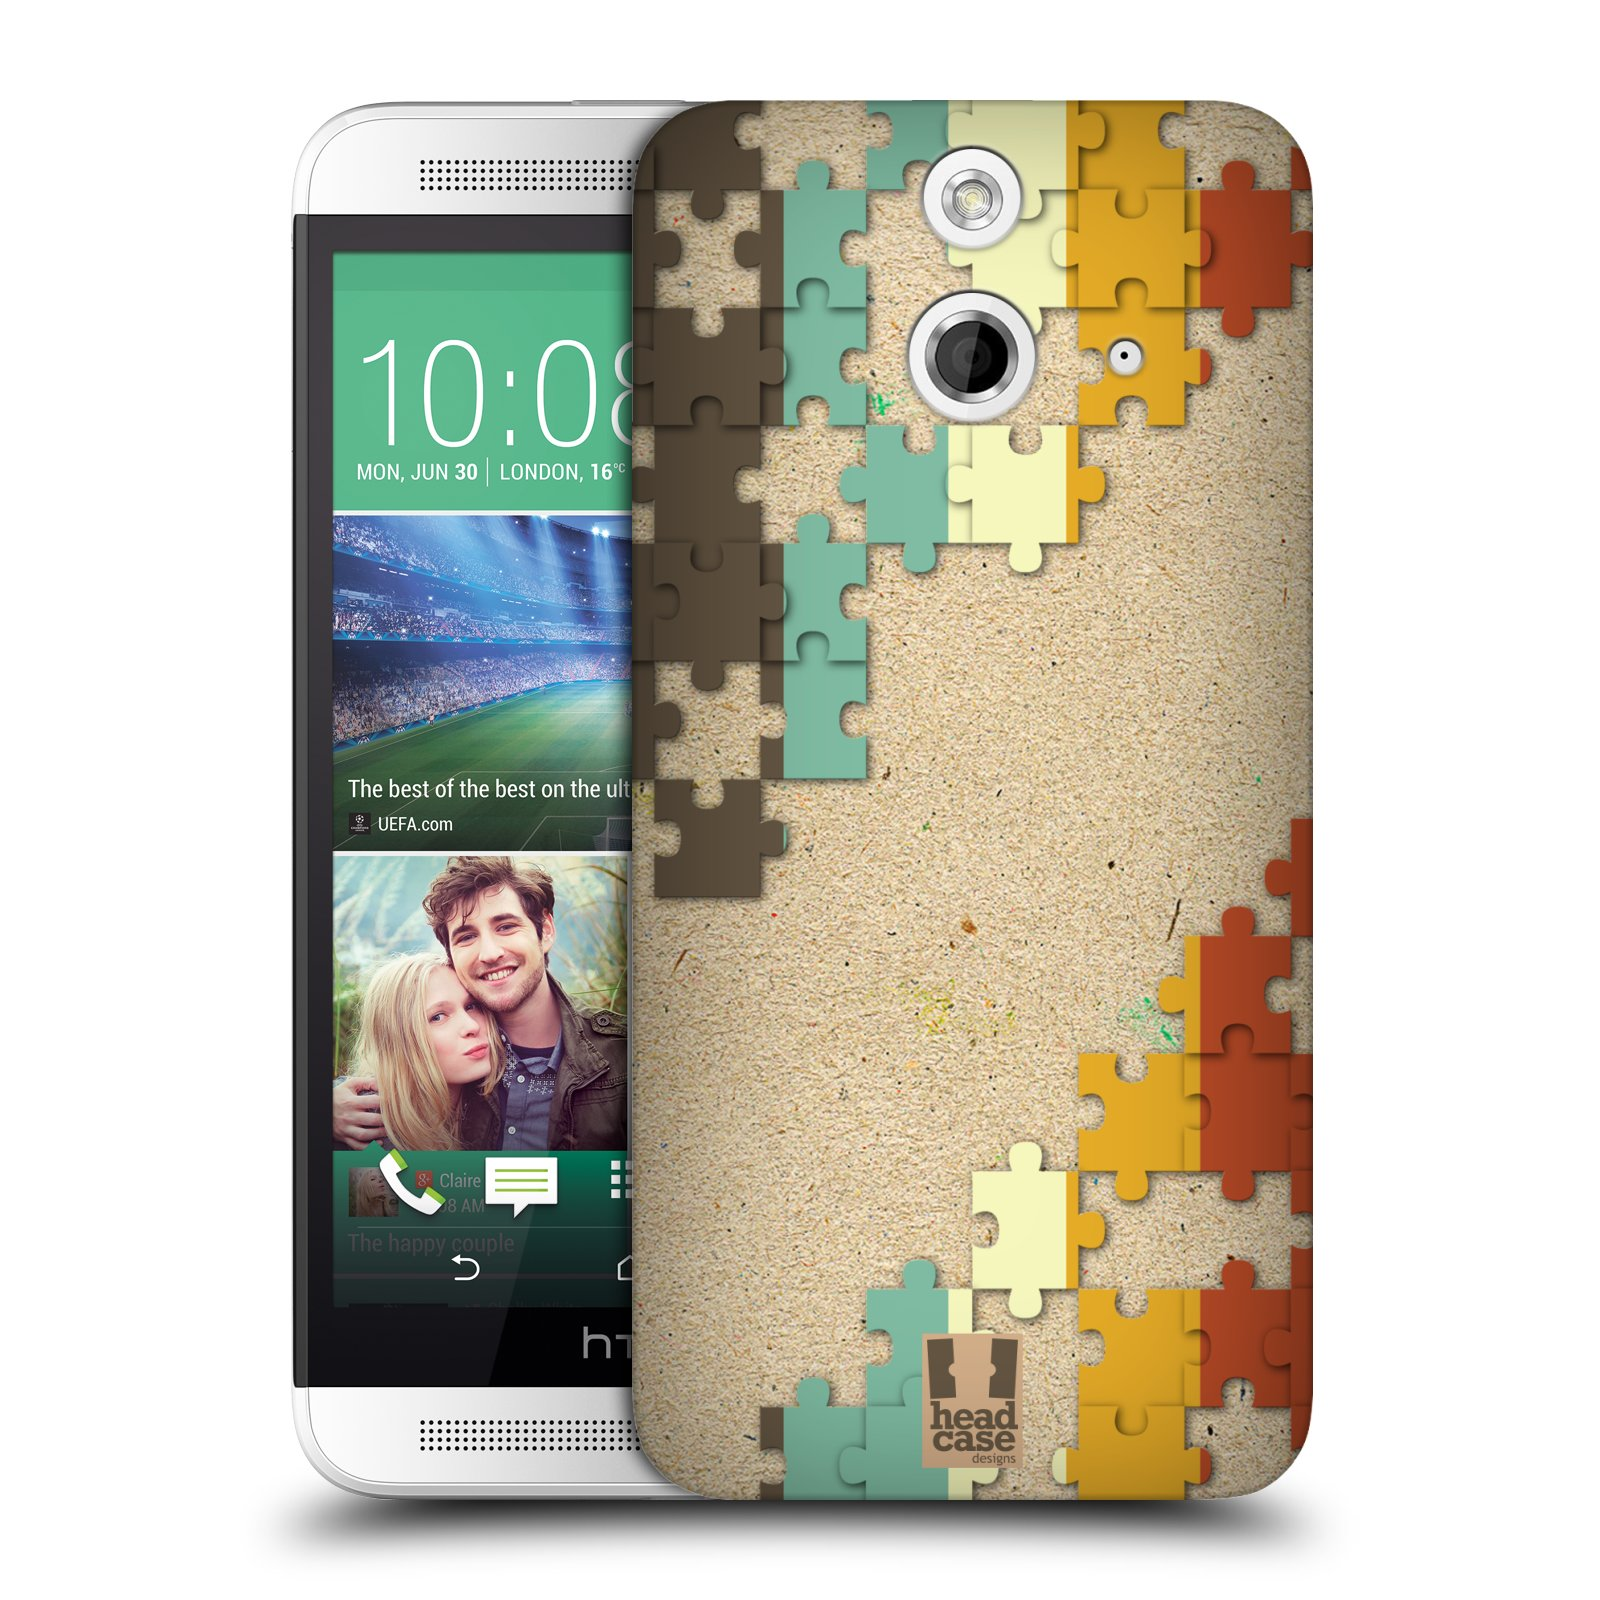 HEAD CASE DESIGNS PUZZLE PIECES HARD BACK CASE FOR HTC ONE E8 DUAL SIM